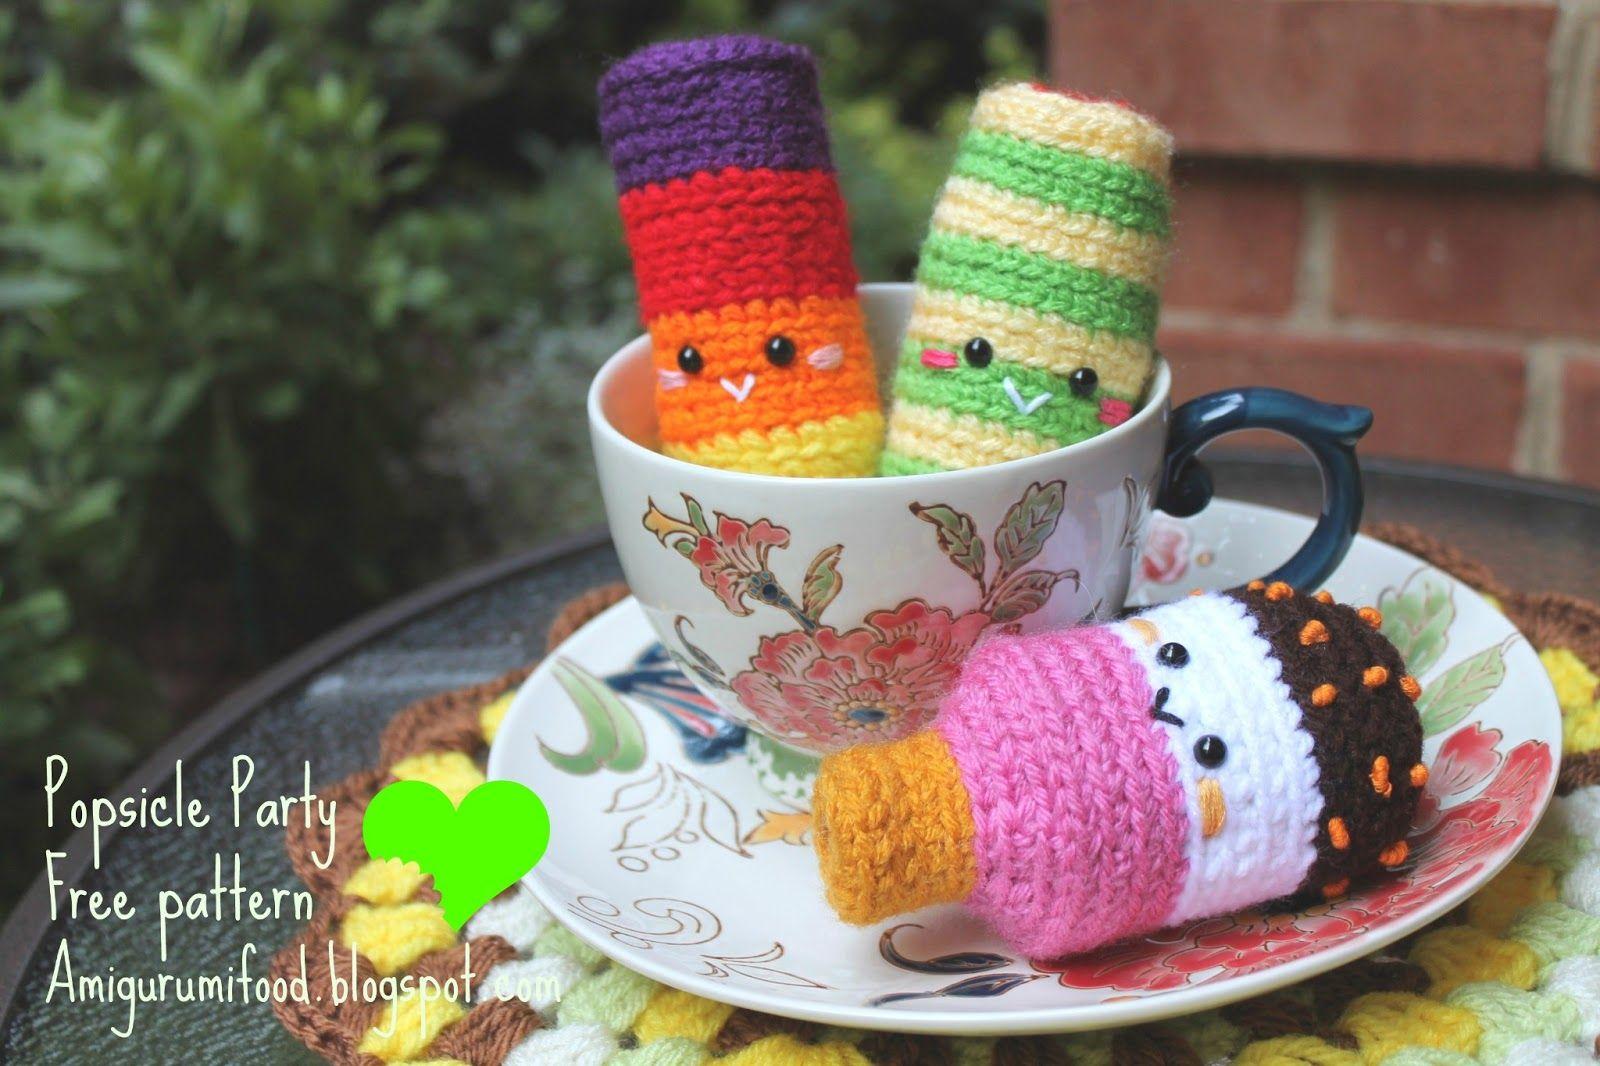 Party popsicle free pattern web patterns giveaways crochet pattern free bankloansurffo Choice Image